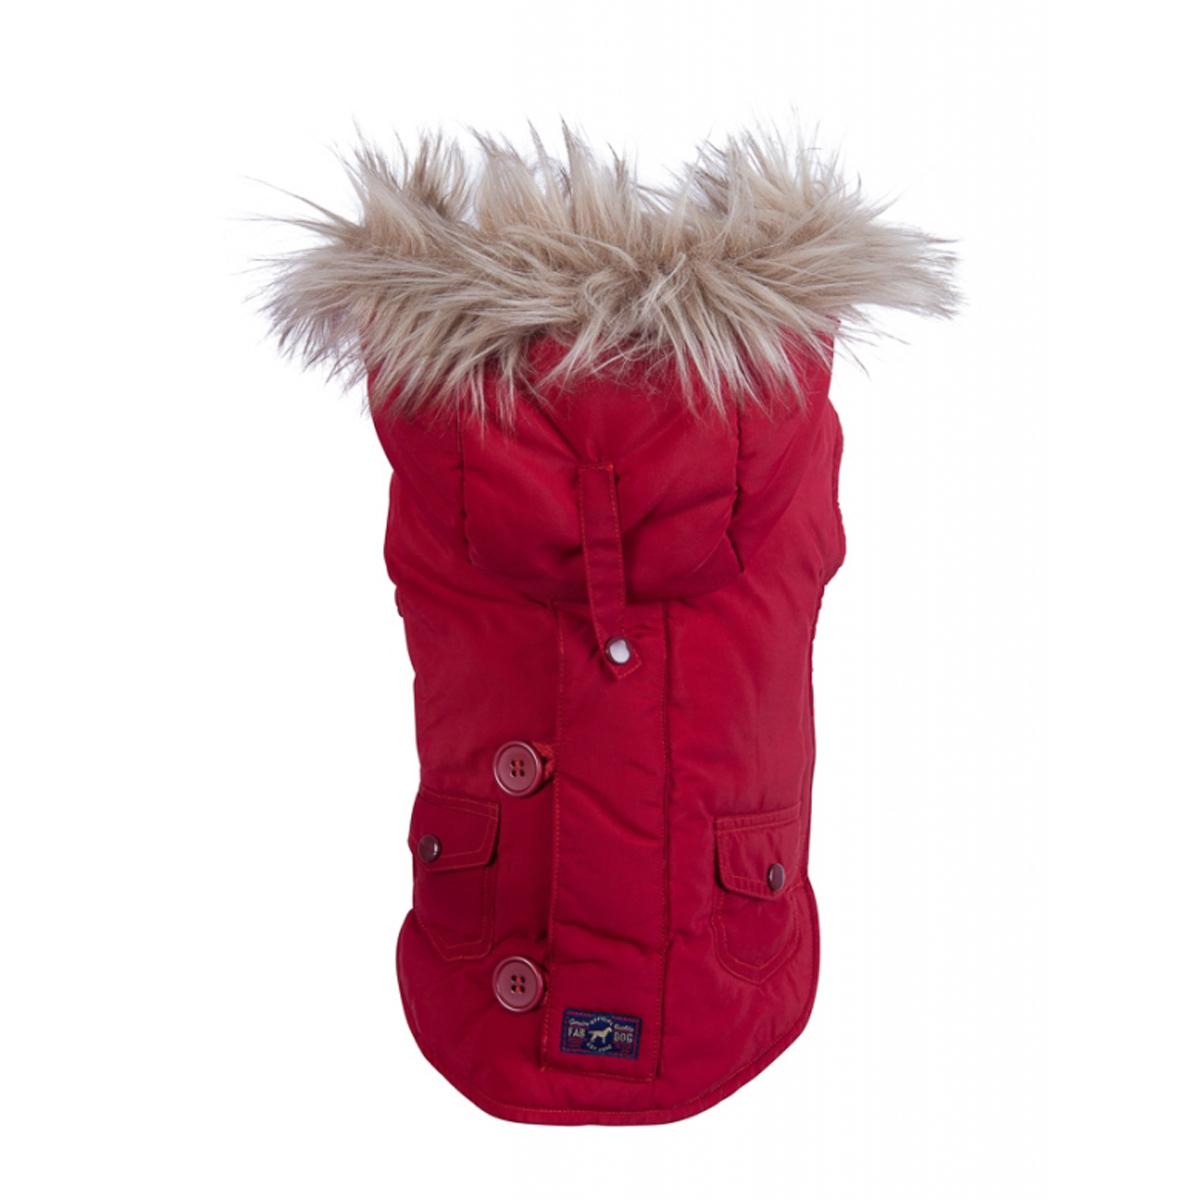 fabdog® Snorkel Dog Jacket - Red